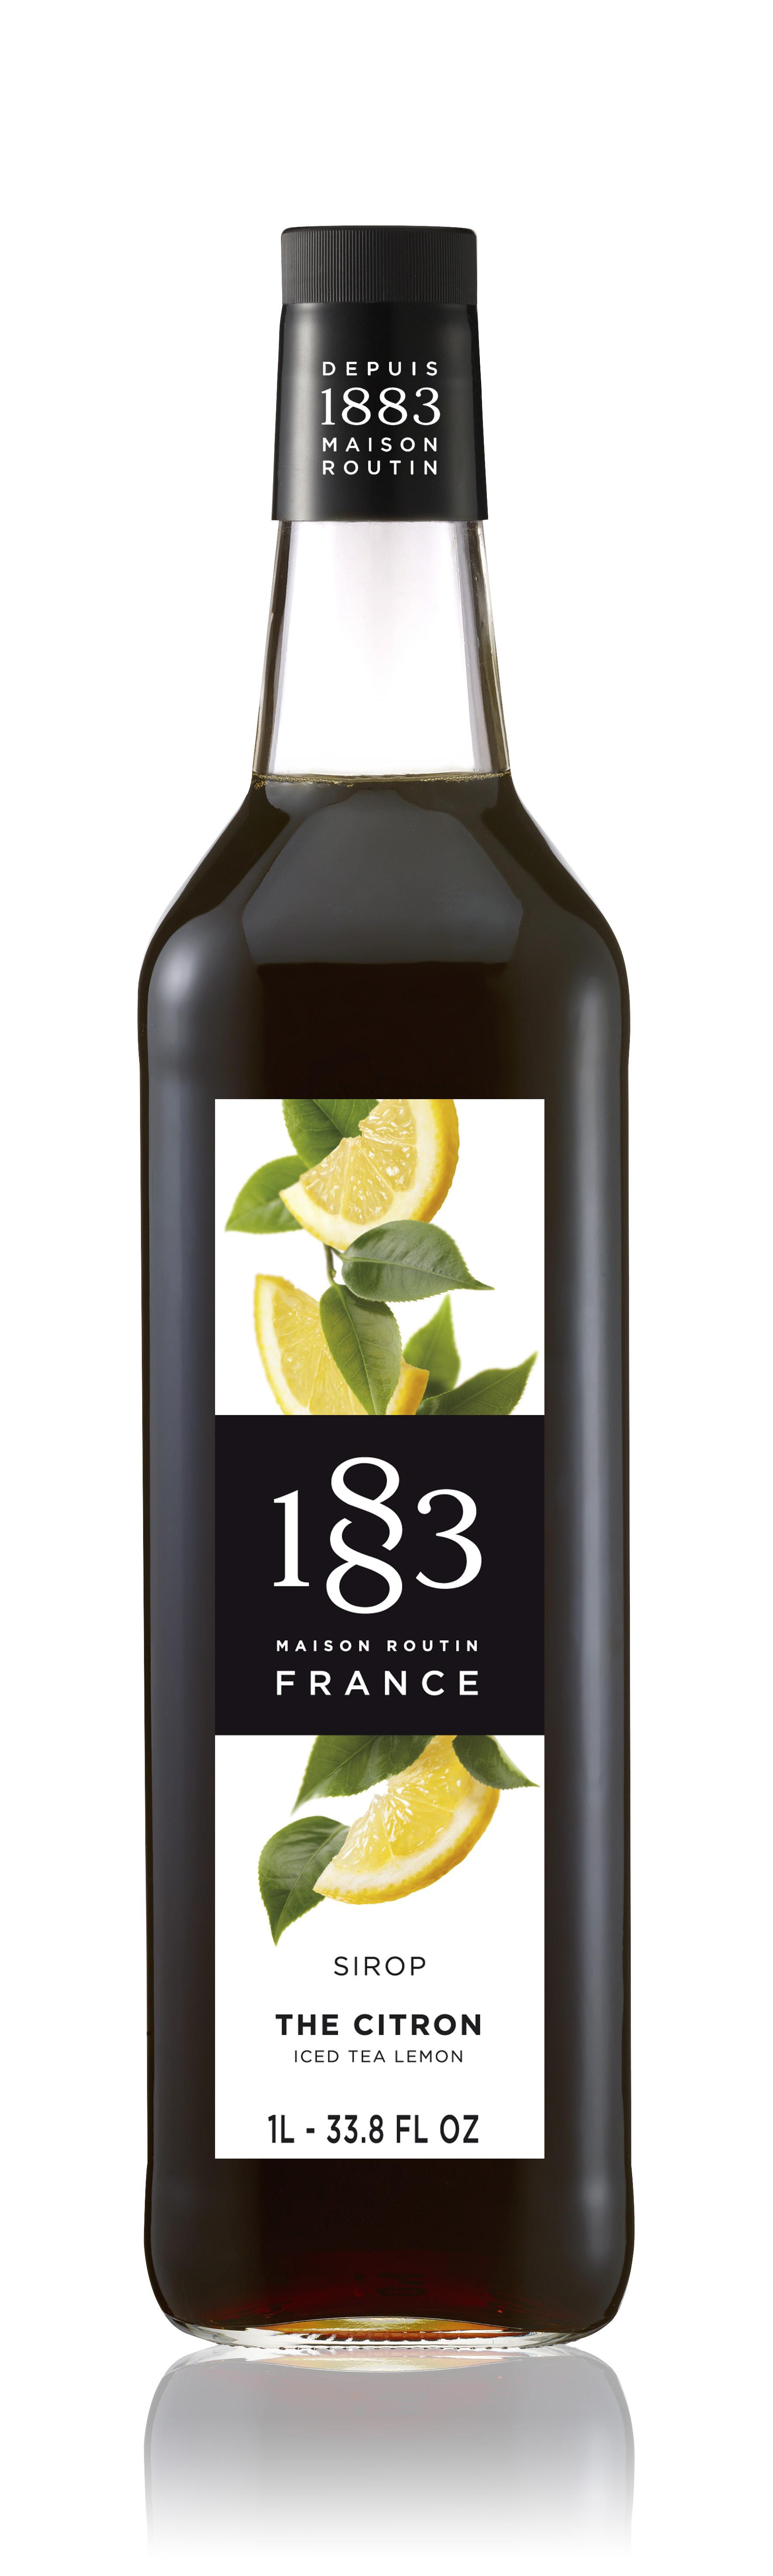 1883 Syrup Iced Tea Lemon 1L Glass Bottle